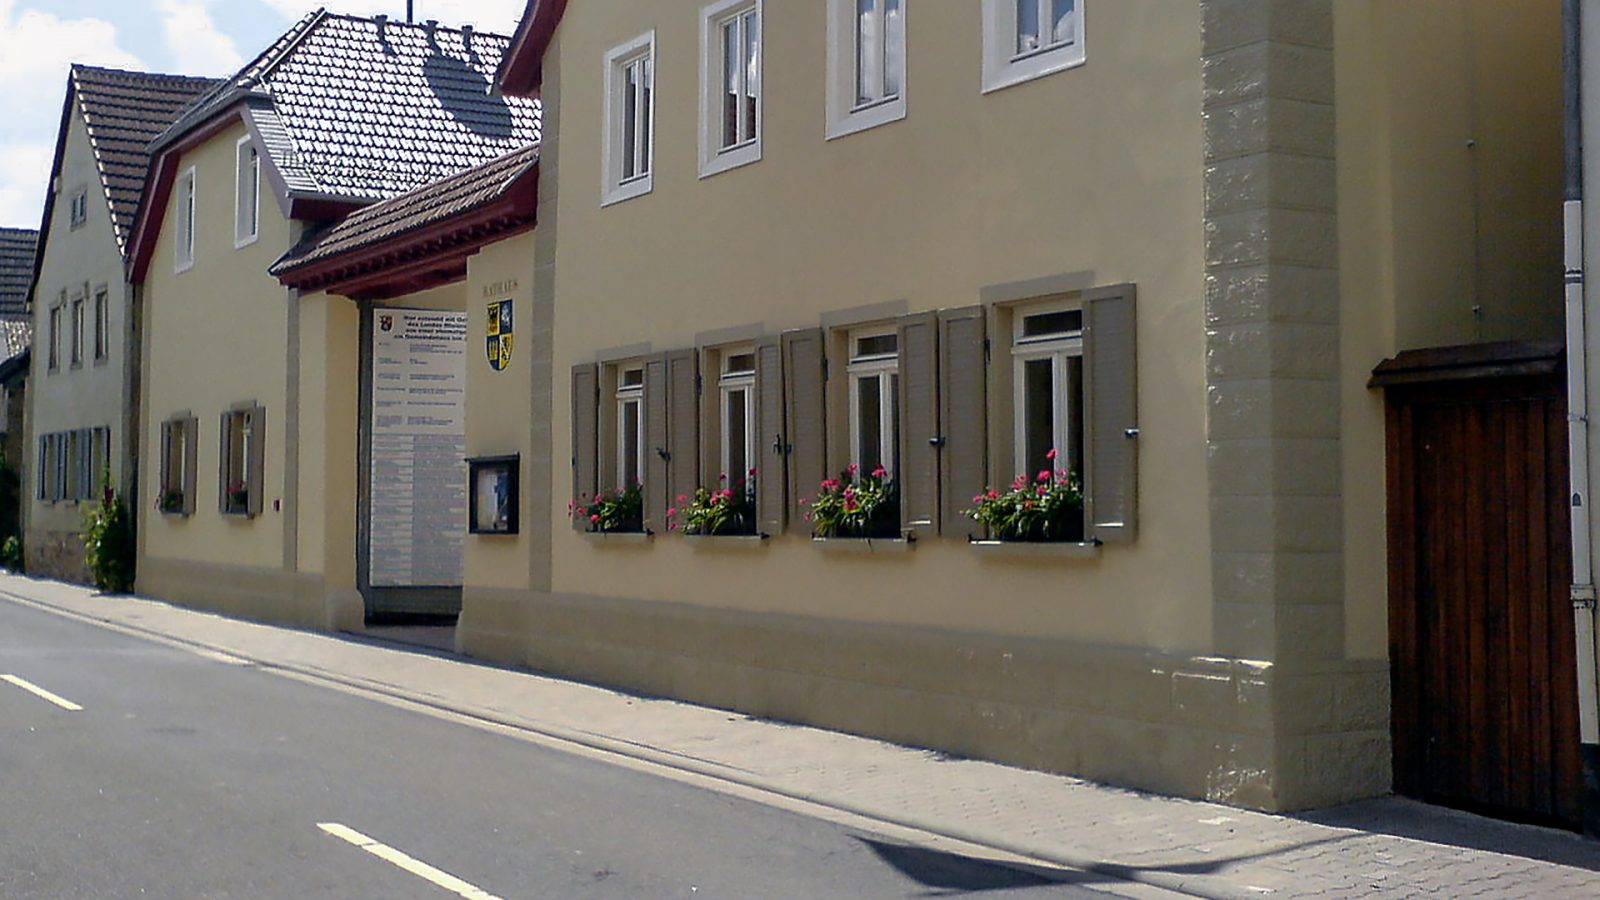 Hofreite Badenheim